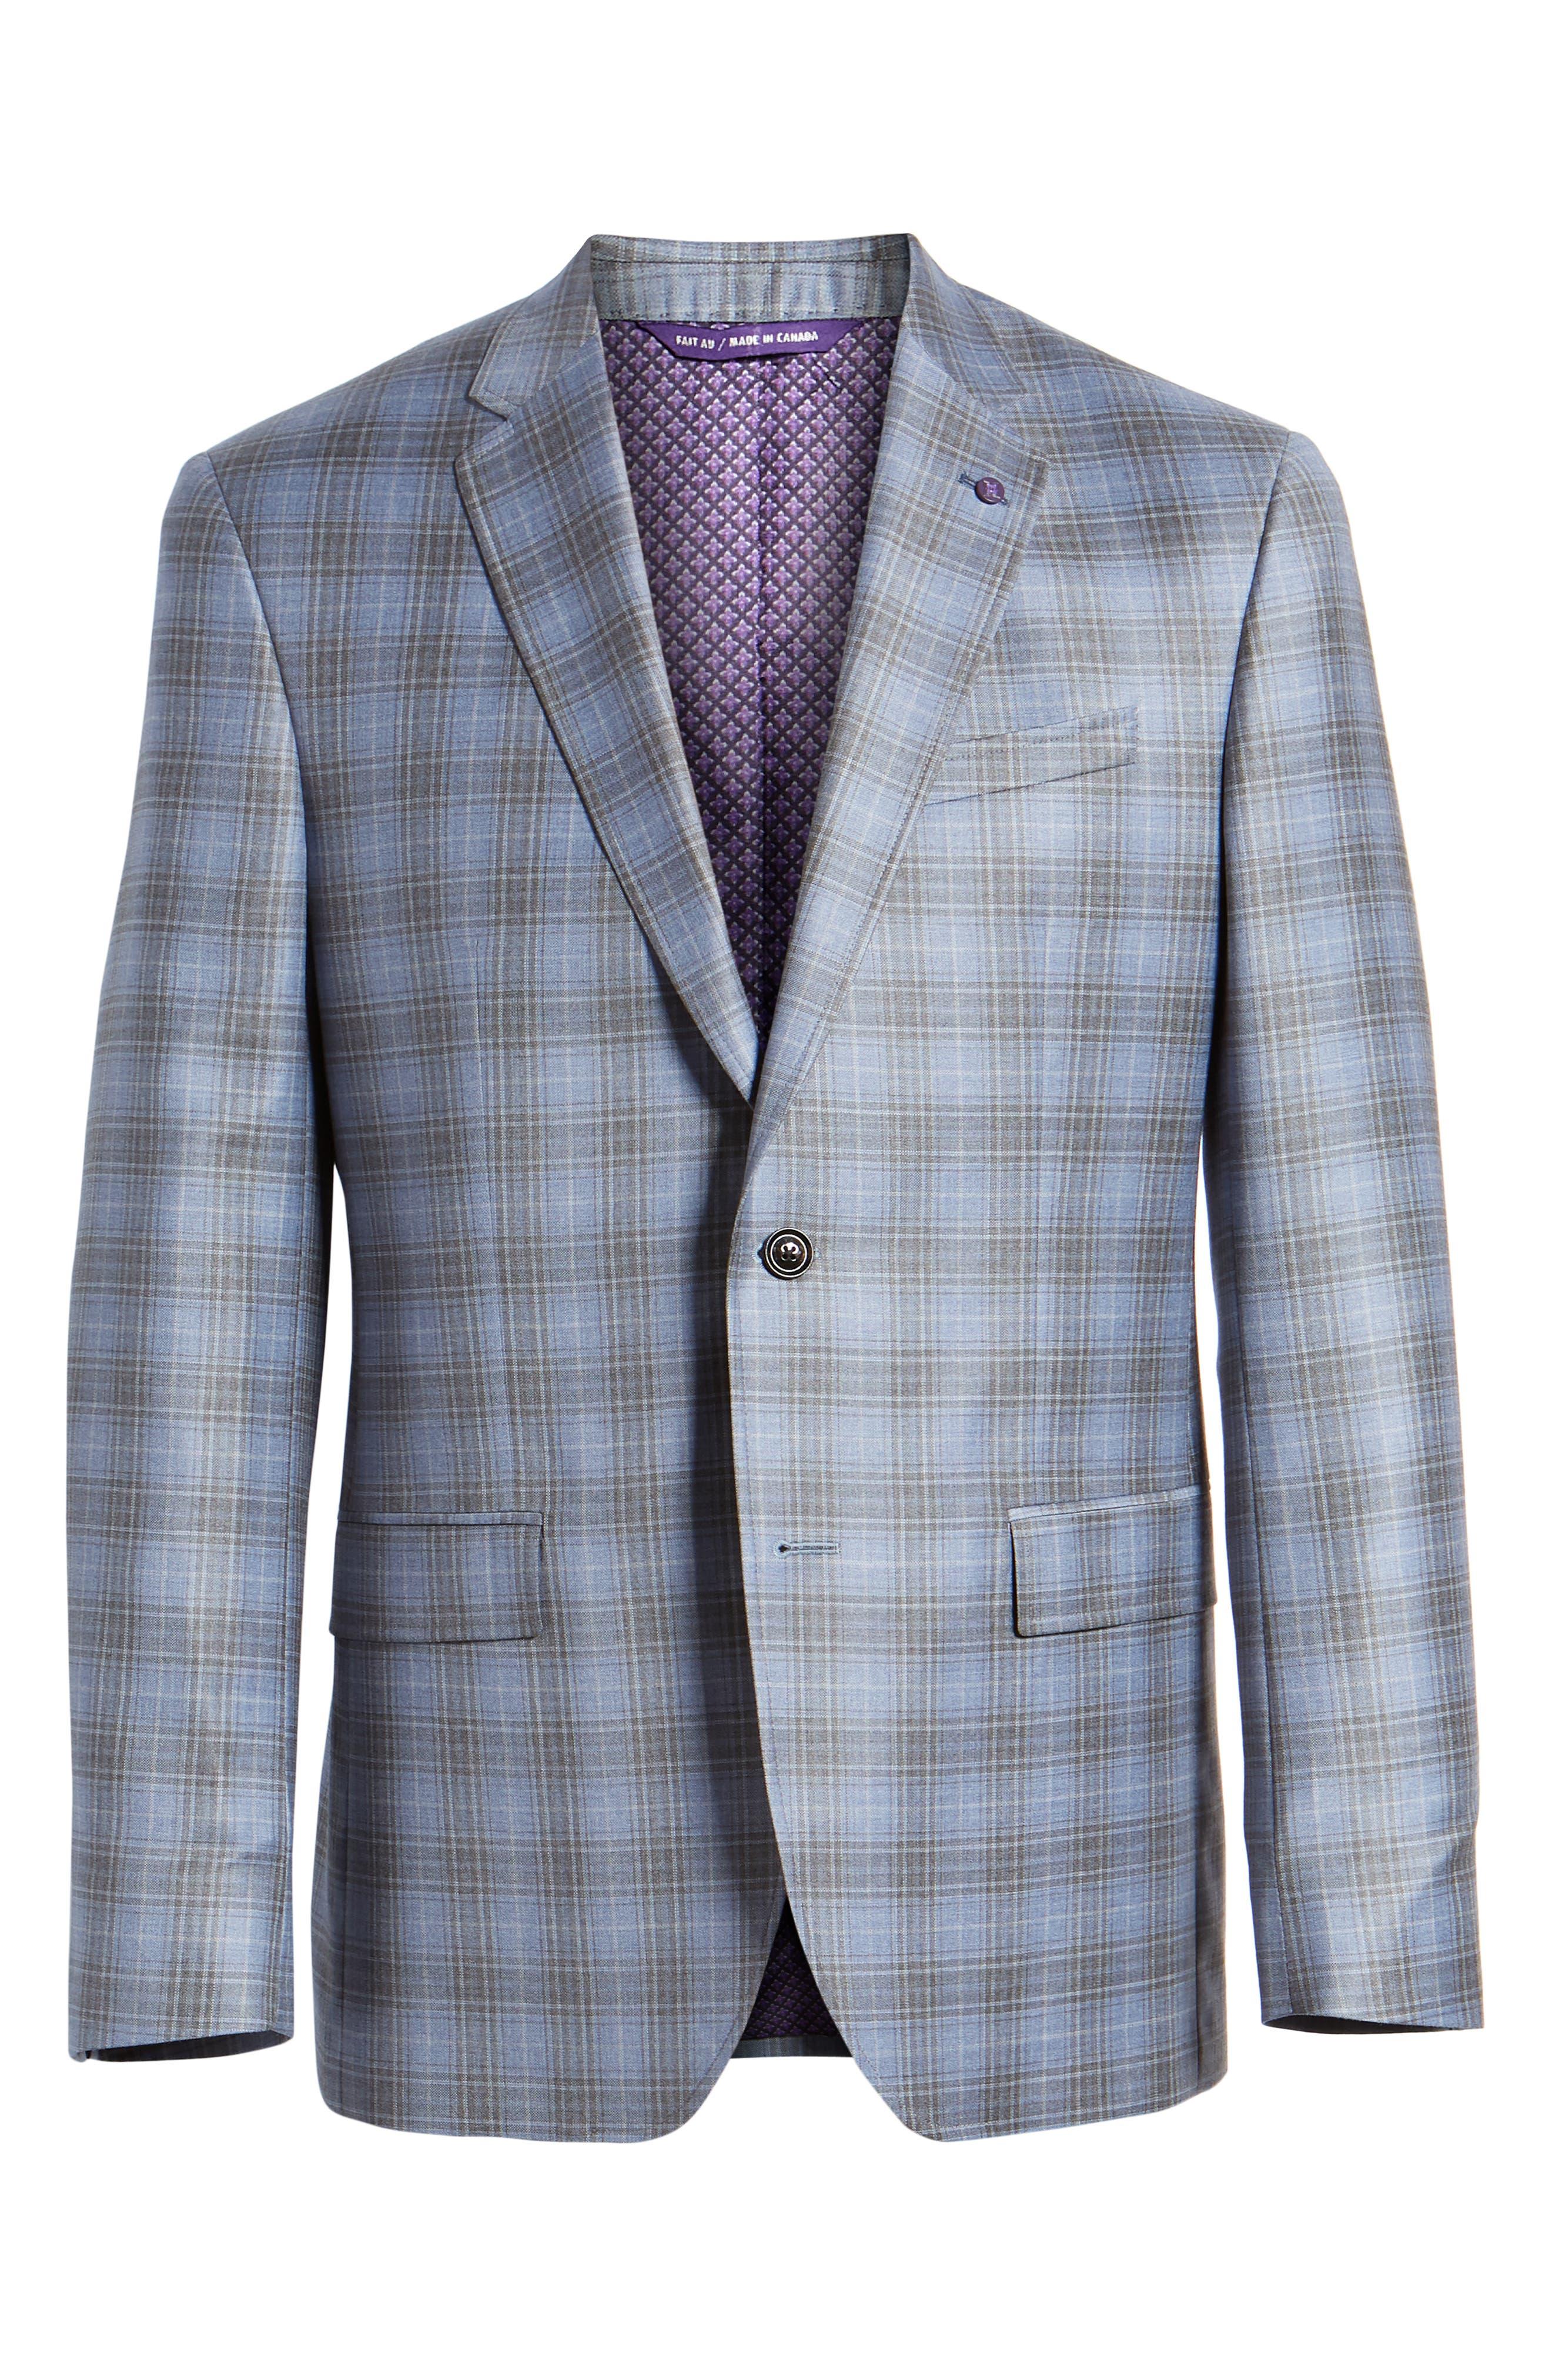 Jay Trim Fit Plaid Wool Sport Coat,                             Alternate thumbnail 6, color,                             Light Blue